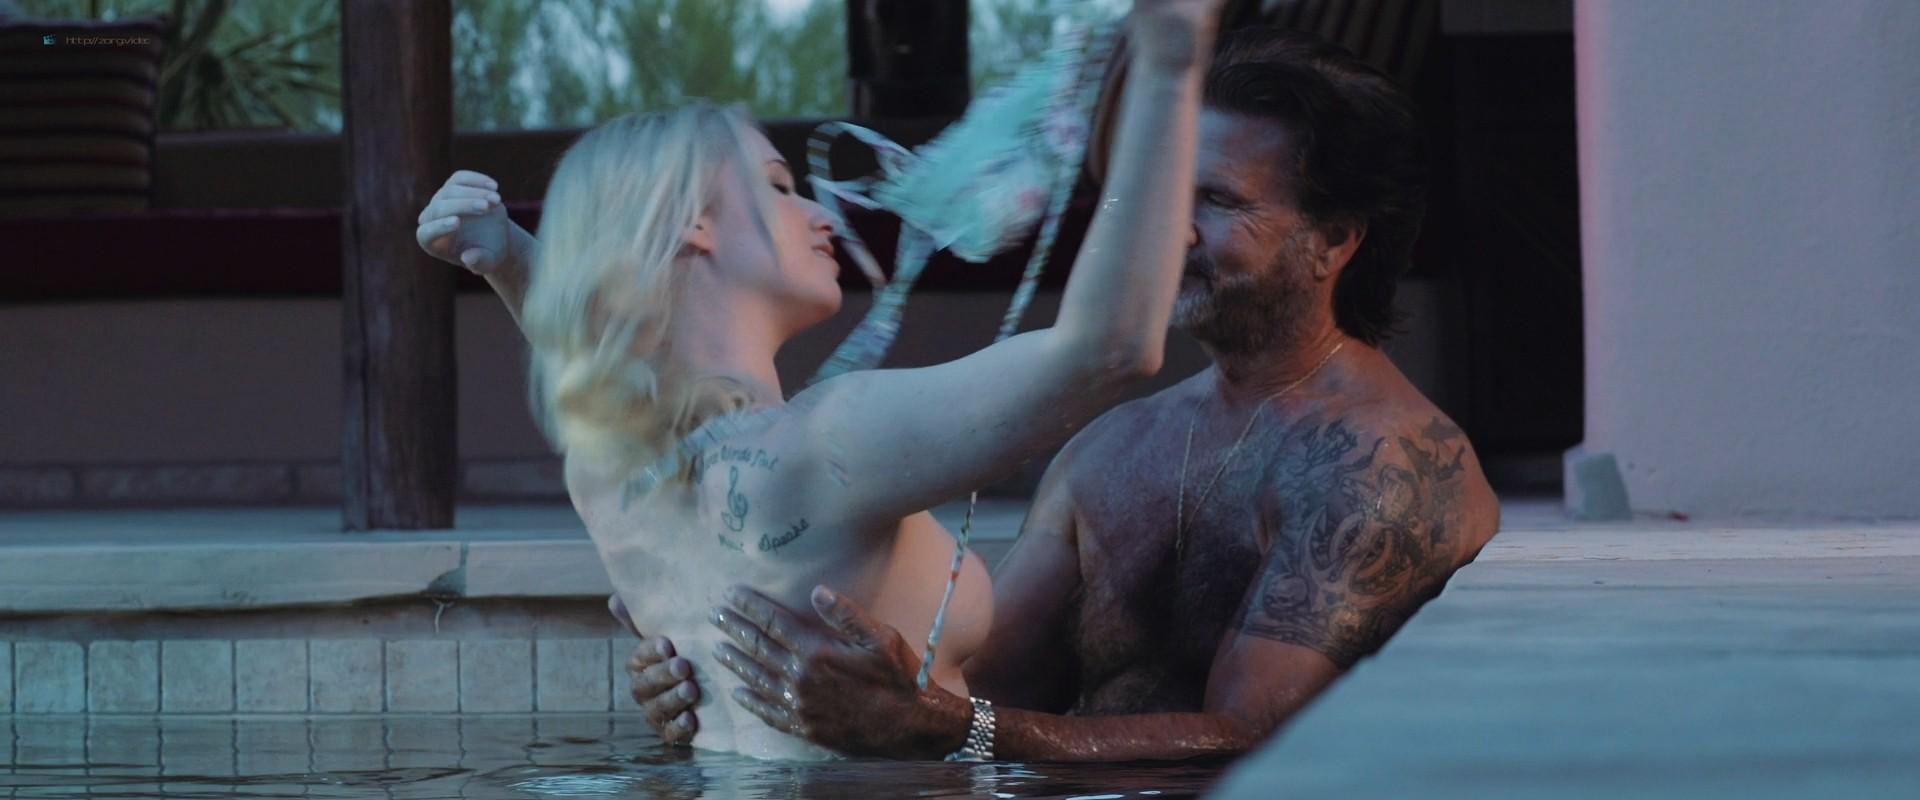 Audrey Beth nude topless Kier Simonetta, Michelle Miller nude too - Water (2019) 1080p (5)